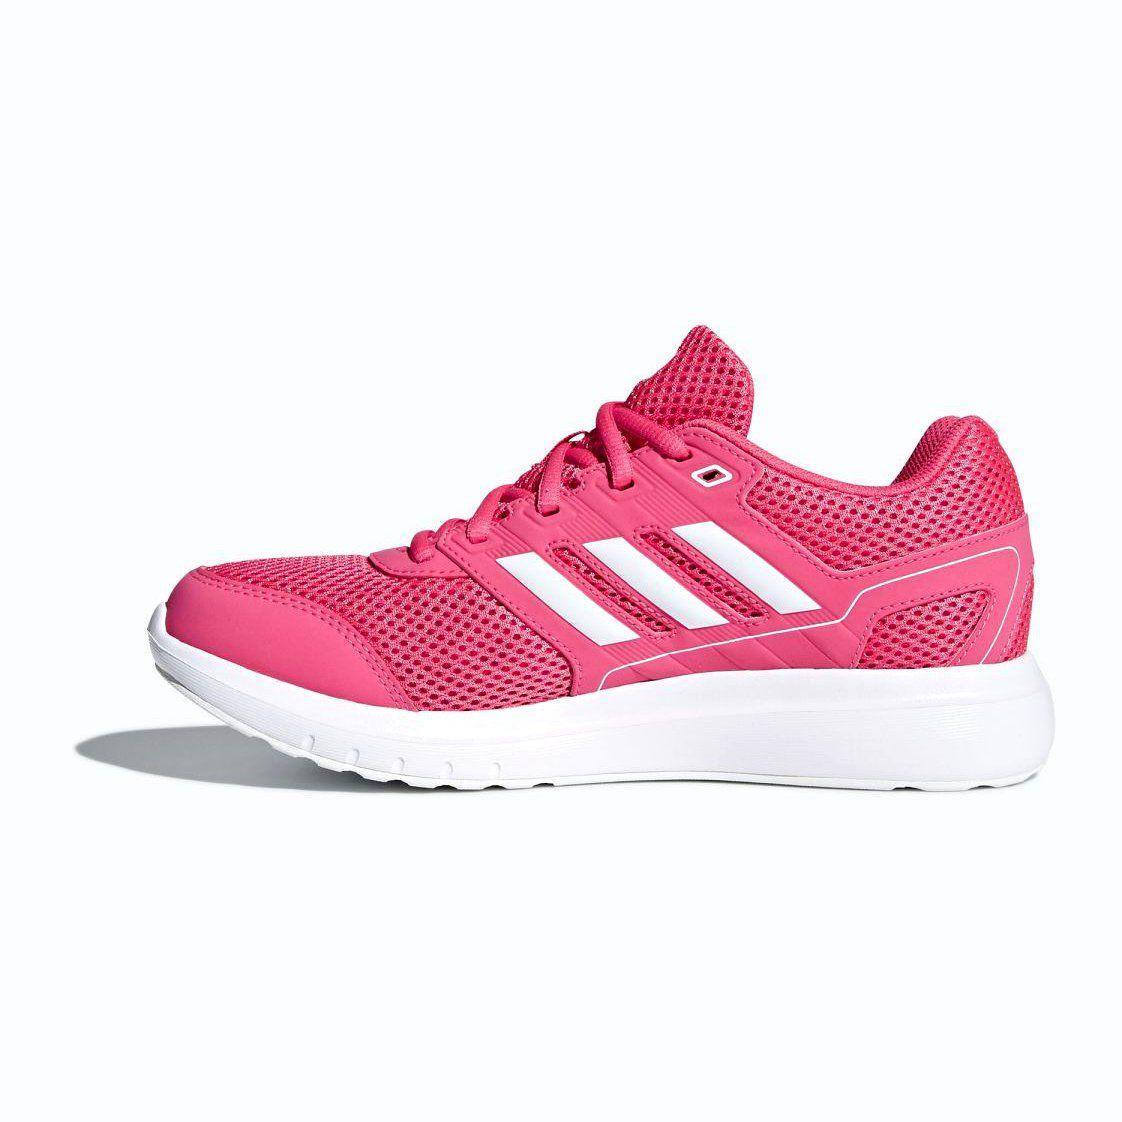 Running Shoes Adidas Duramo Lite 2 0 W Cg4054 Pink Adidas Running Shoes Running Shoes Adidas